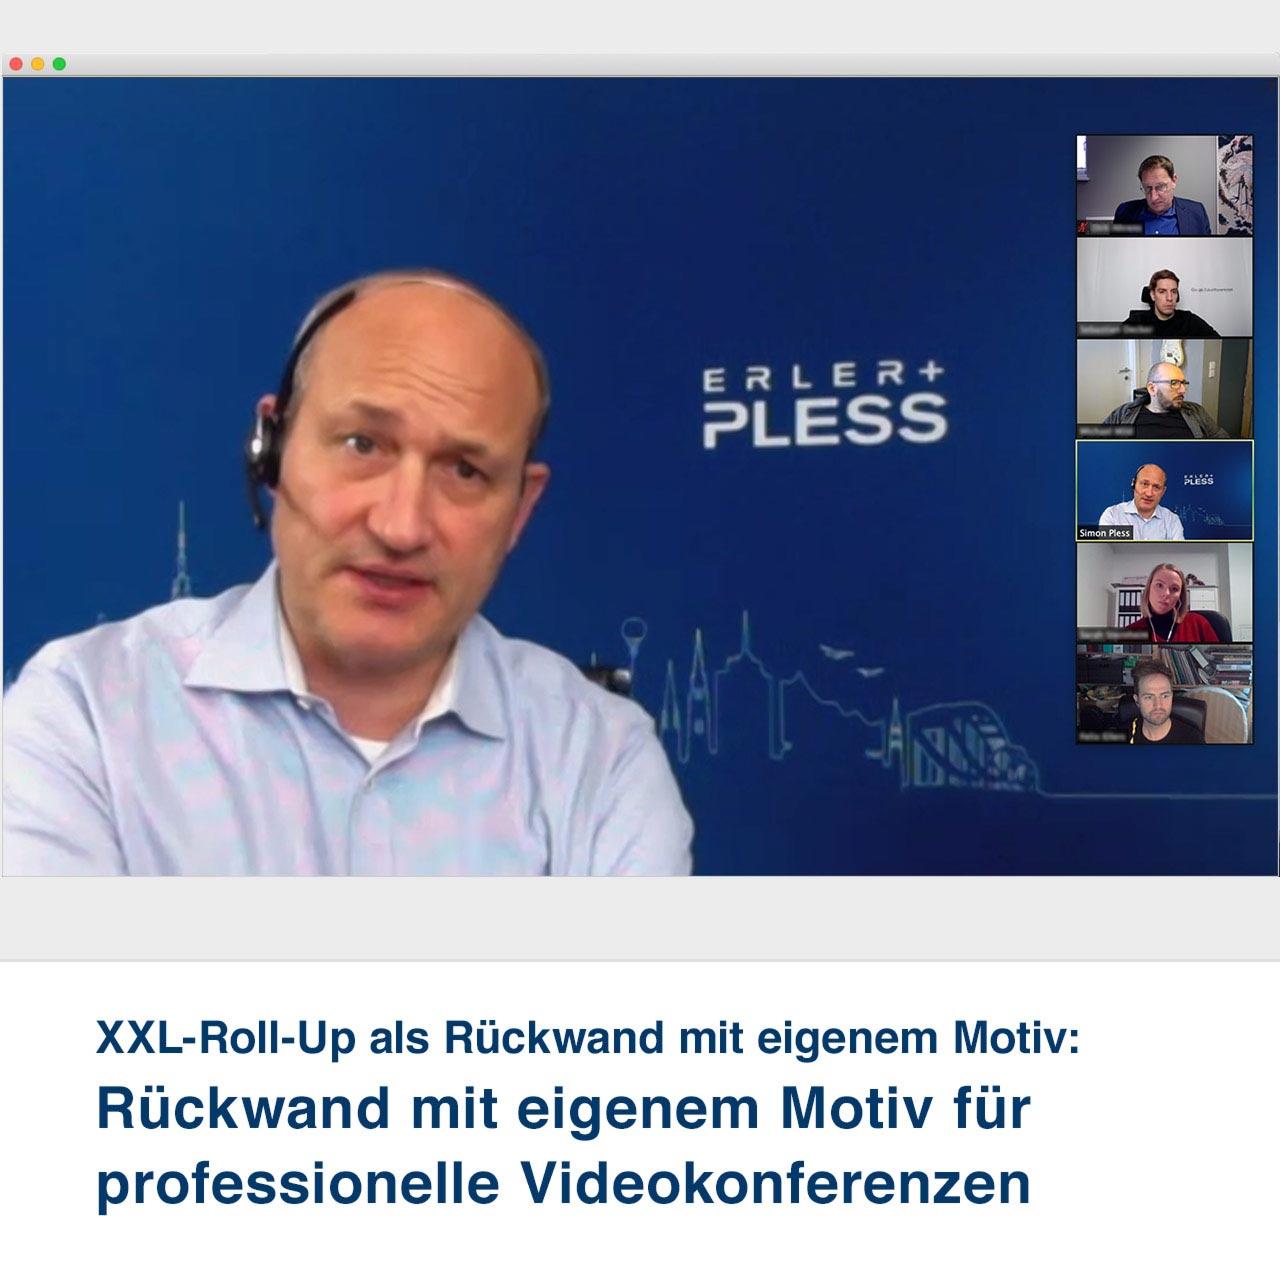 XXL-Roll-Up als Rückwand mit eigenem Motiv:   Rückwand mit eigenem Motiv für  professionelle Videokonferenzen